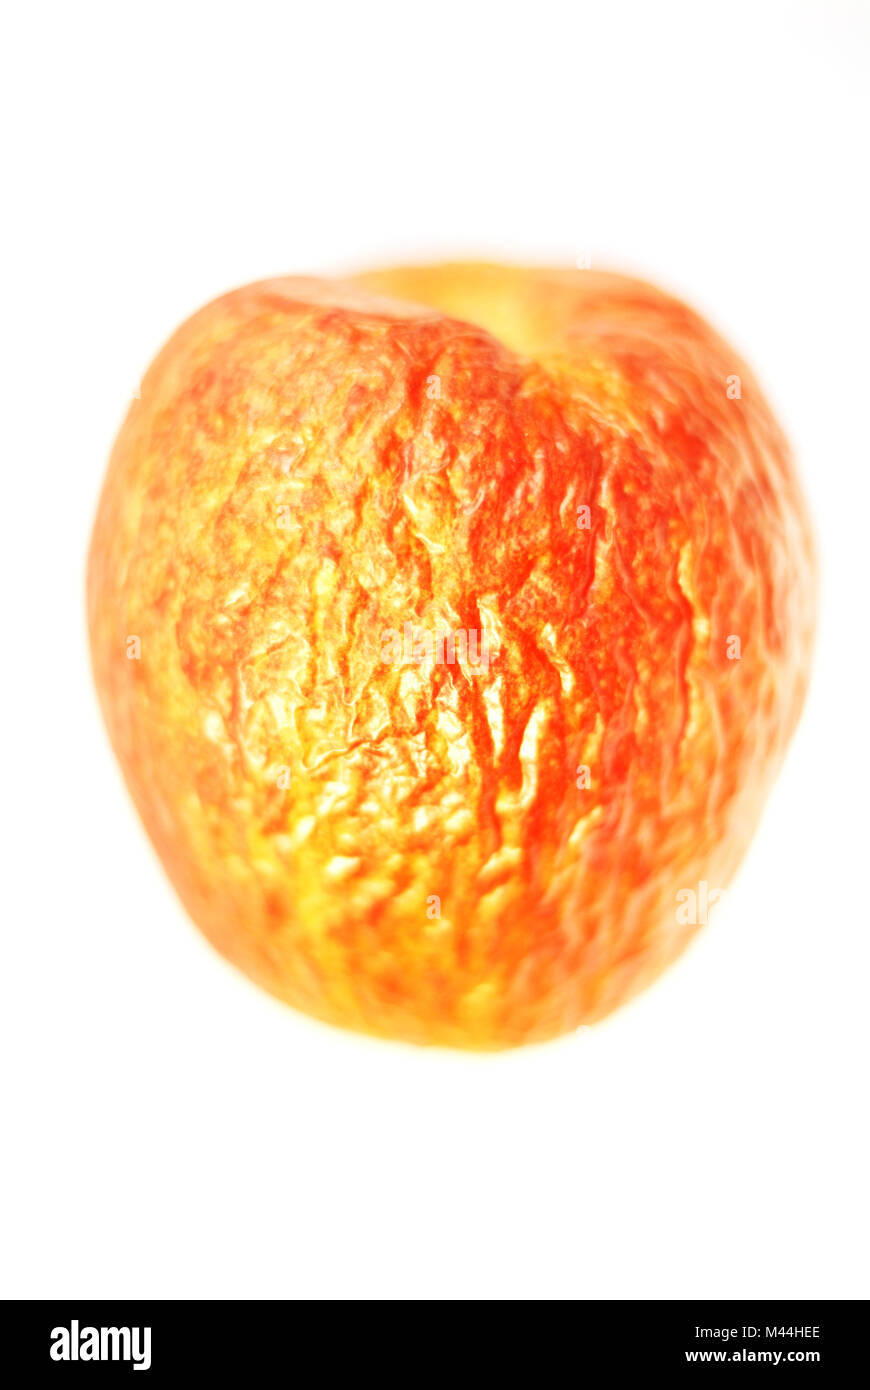 apple - Stock Image